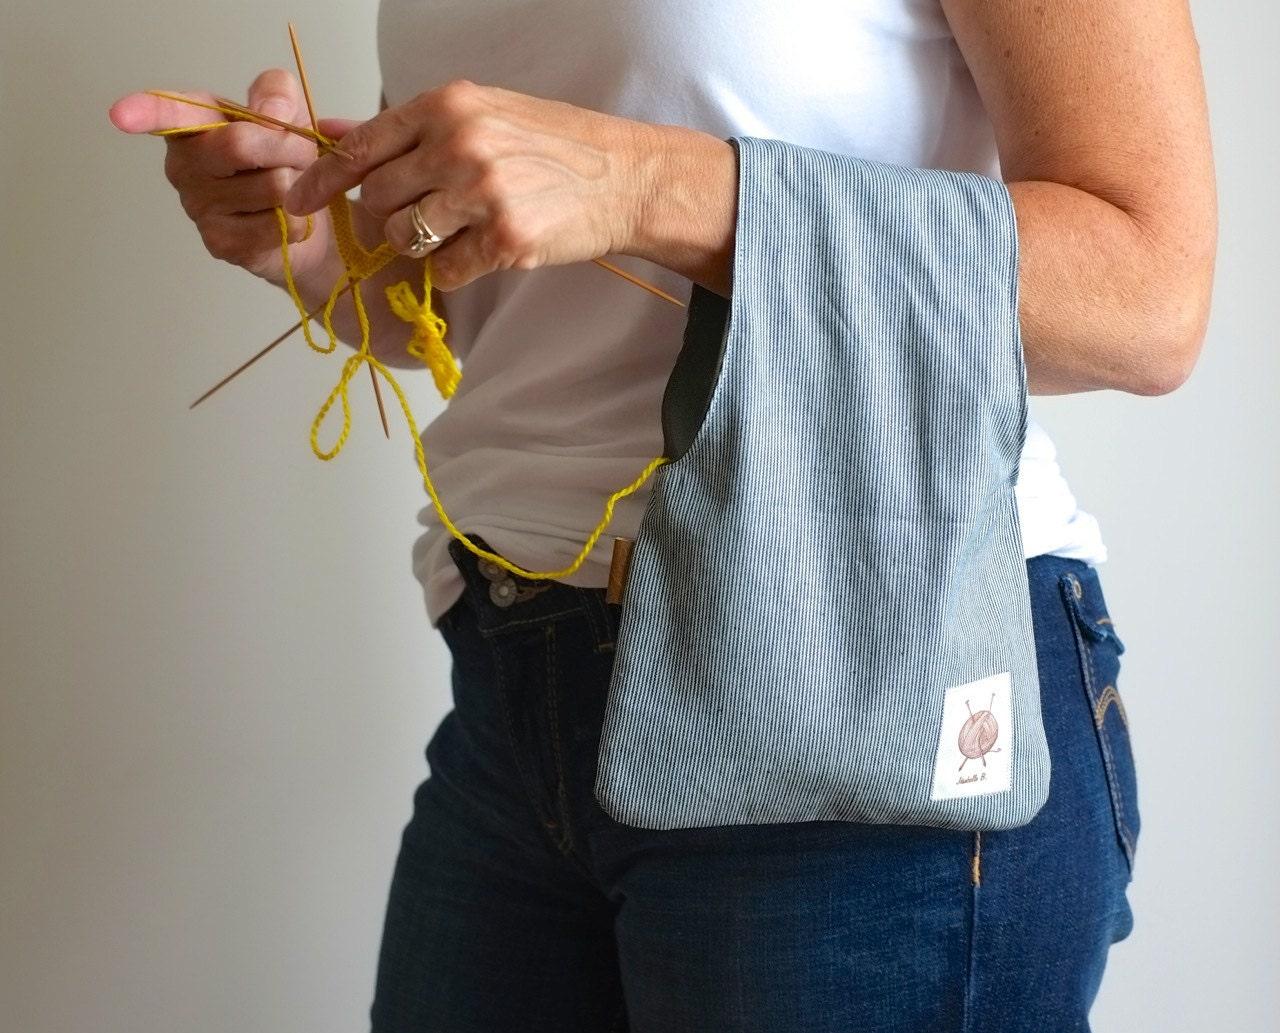 Knitting bag Project bag Striped pouch Wristlet by JesabelleB